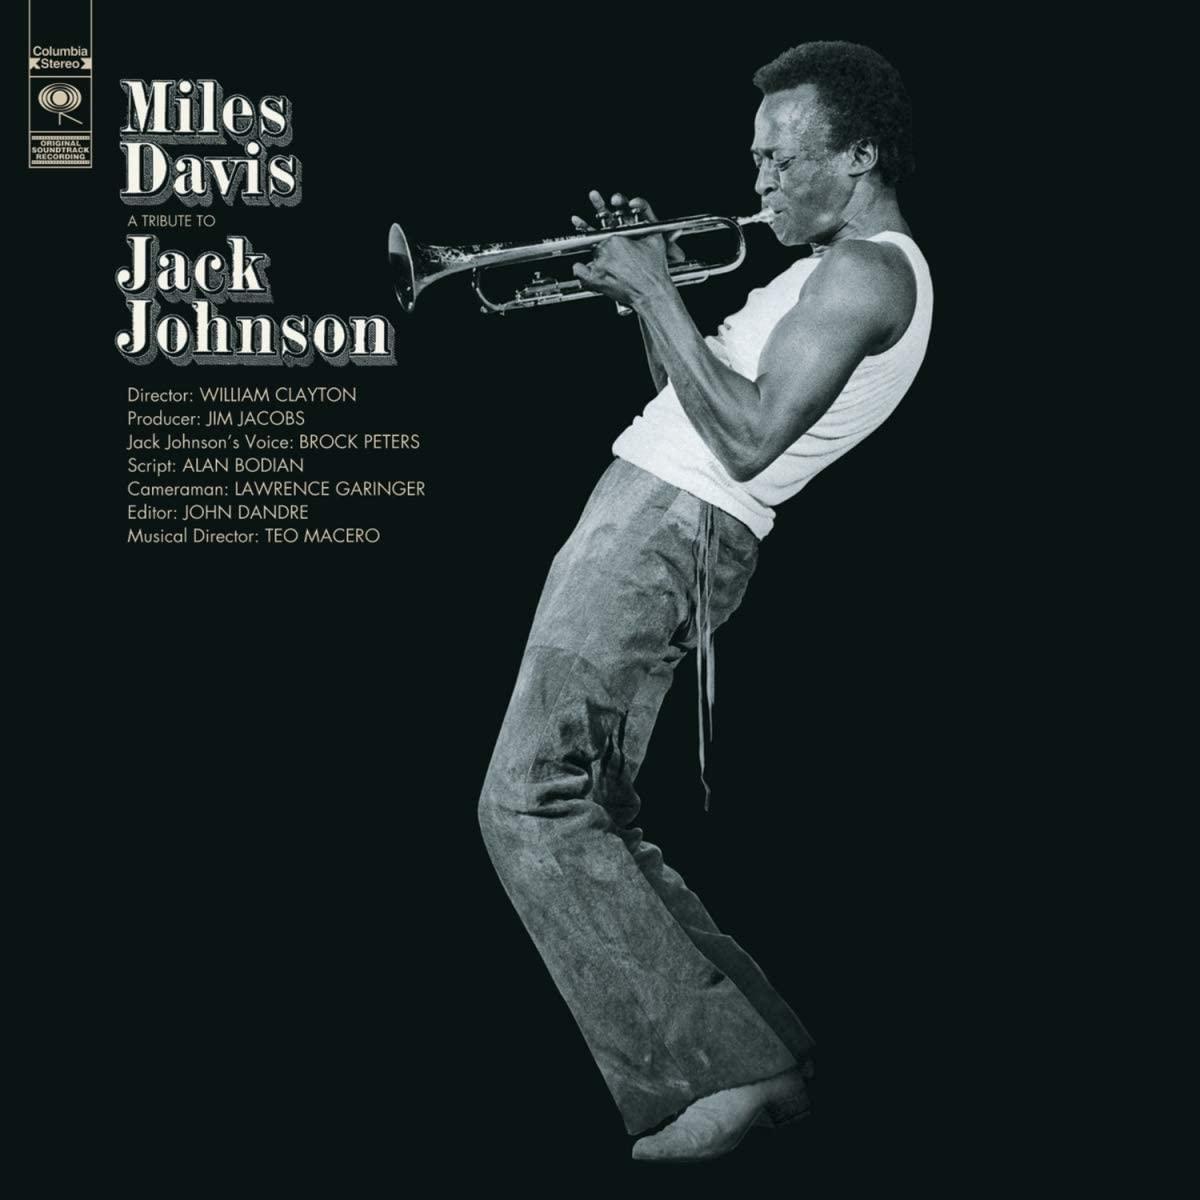 Copertina Vinile 33 giri A Tribute to Jack Johnson di Miles Davis